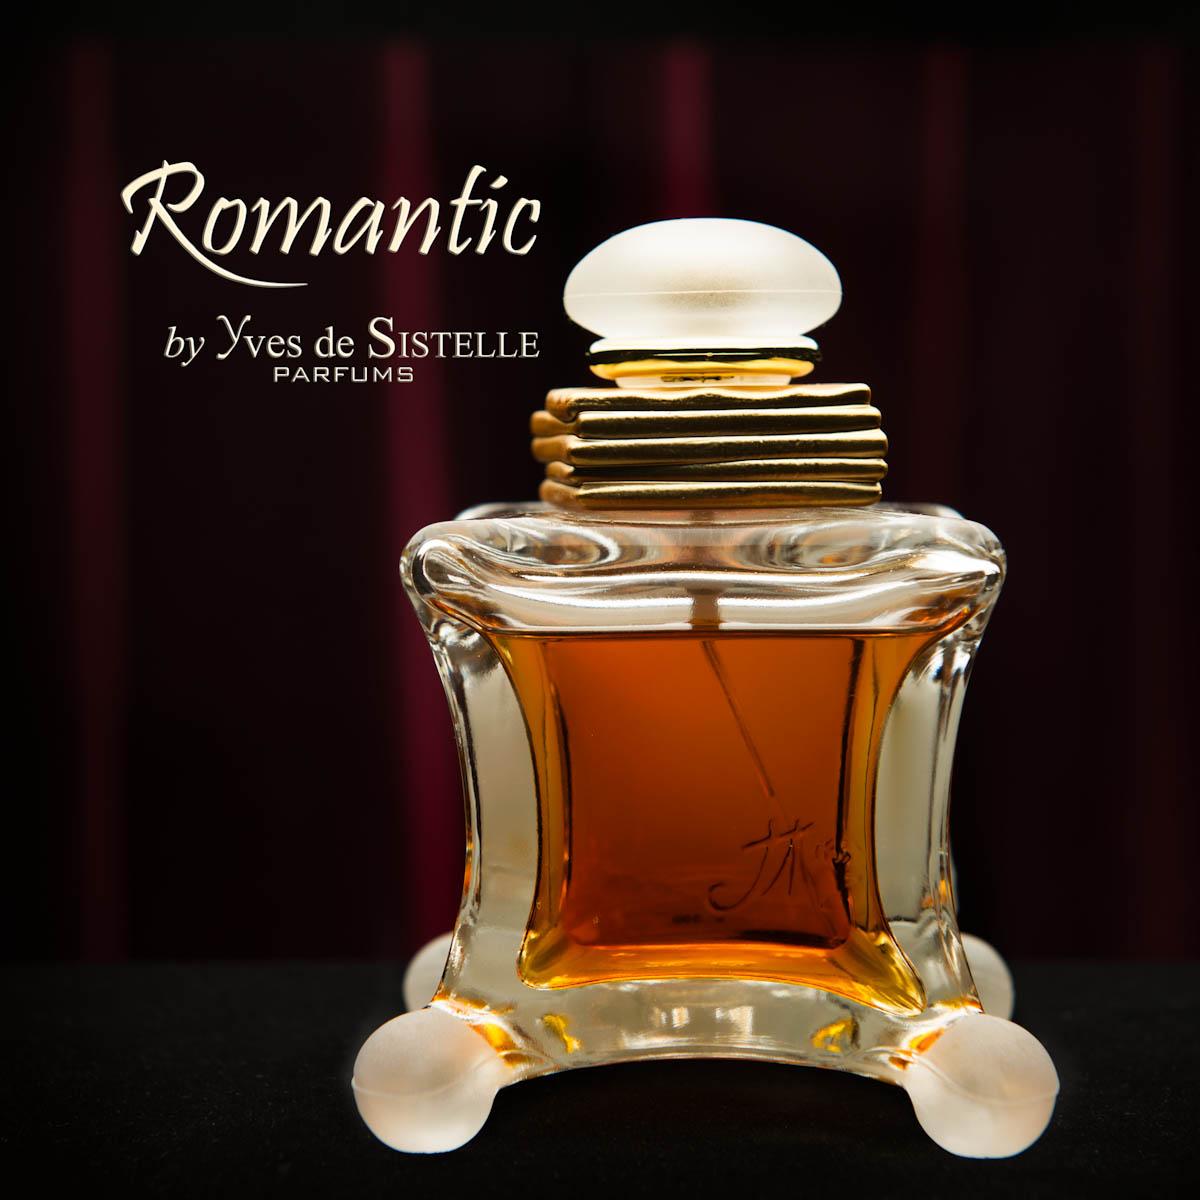 Jeanne Arthes Romantic For Women Edp 100ml Daftar Harga Termurah Parfum Original Boum Vanille Cassandra Violette Intense Perfumestore Source Perfume By Yves De Sistelle